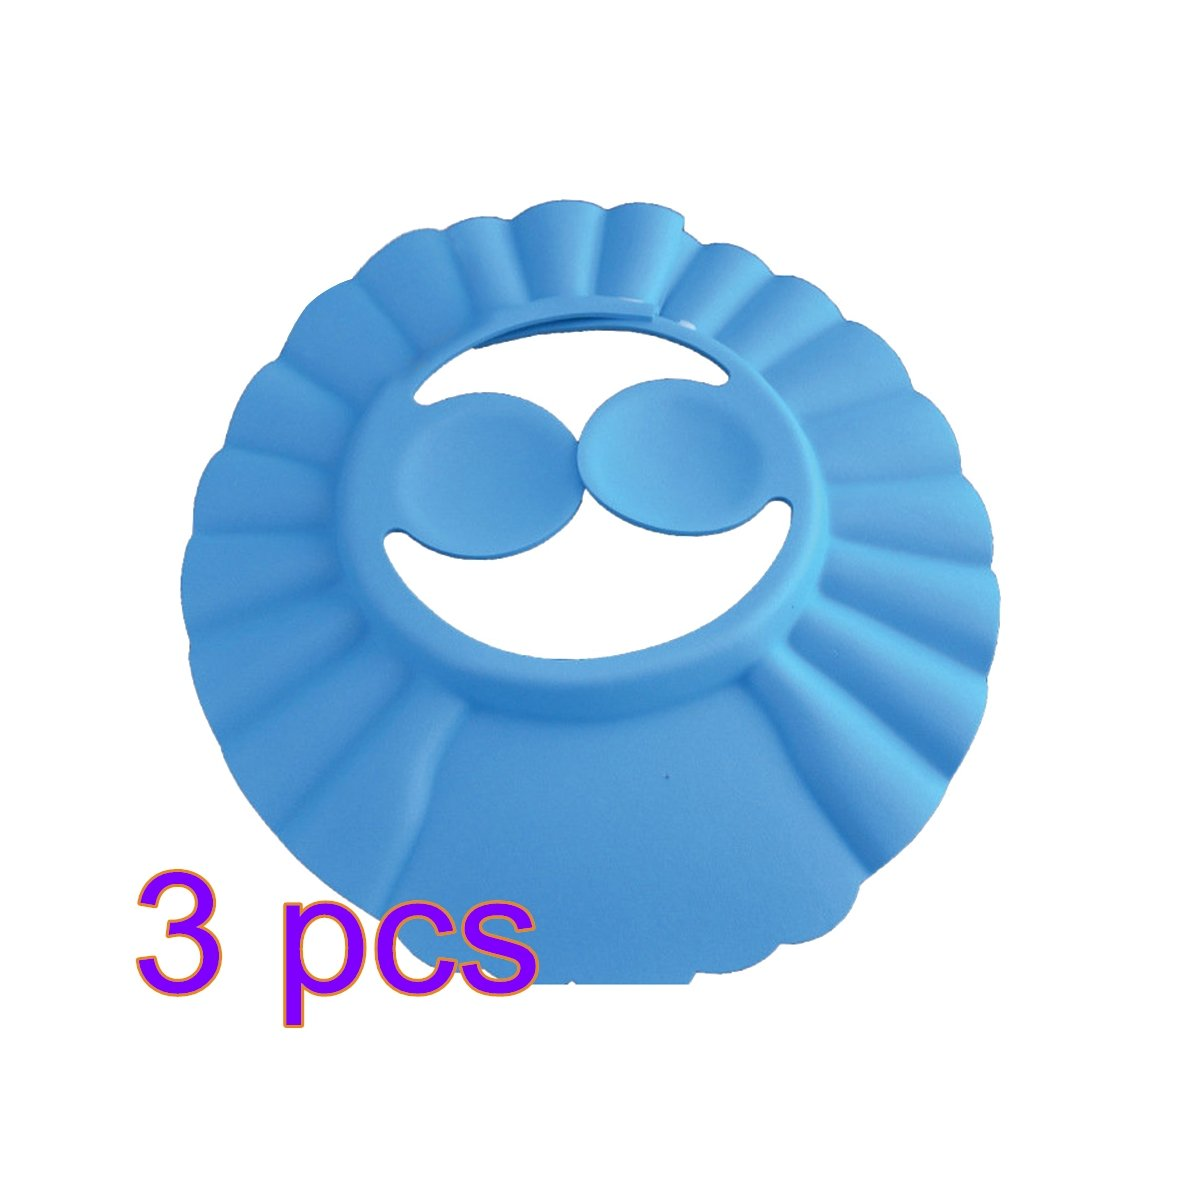 OUNONA Gorro de Ducha/ Baño para Bebé Gorro Protector para Lavar el Cabello de Niño Protección para los Oídos